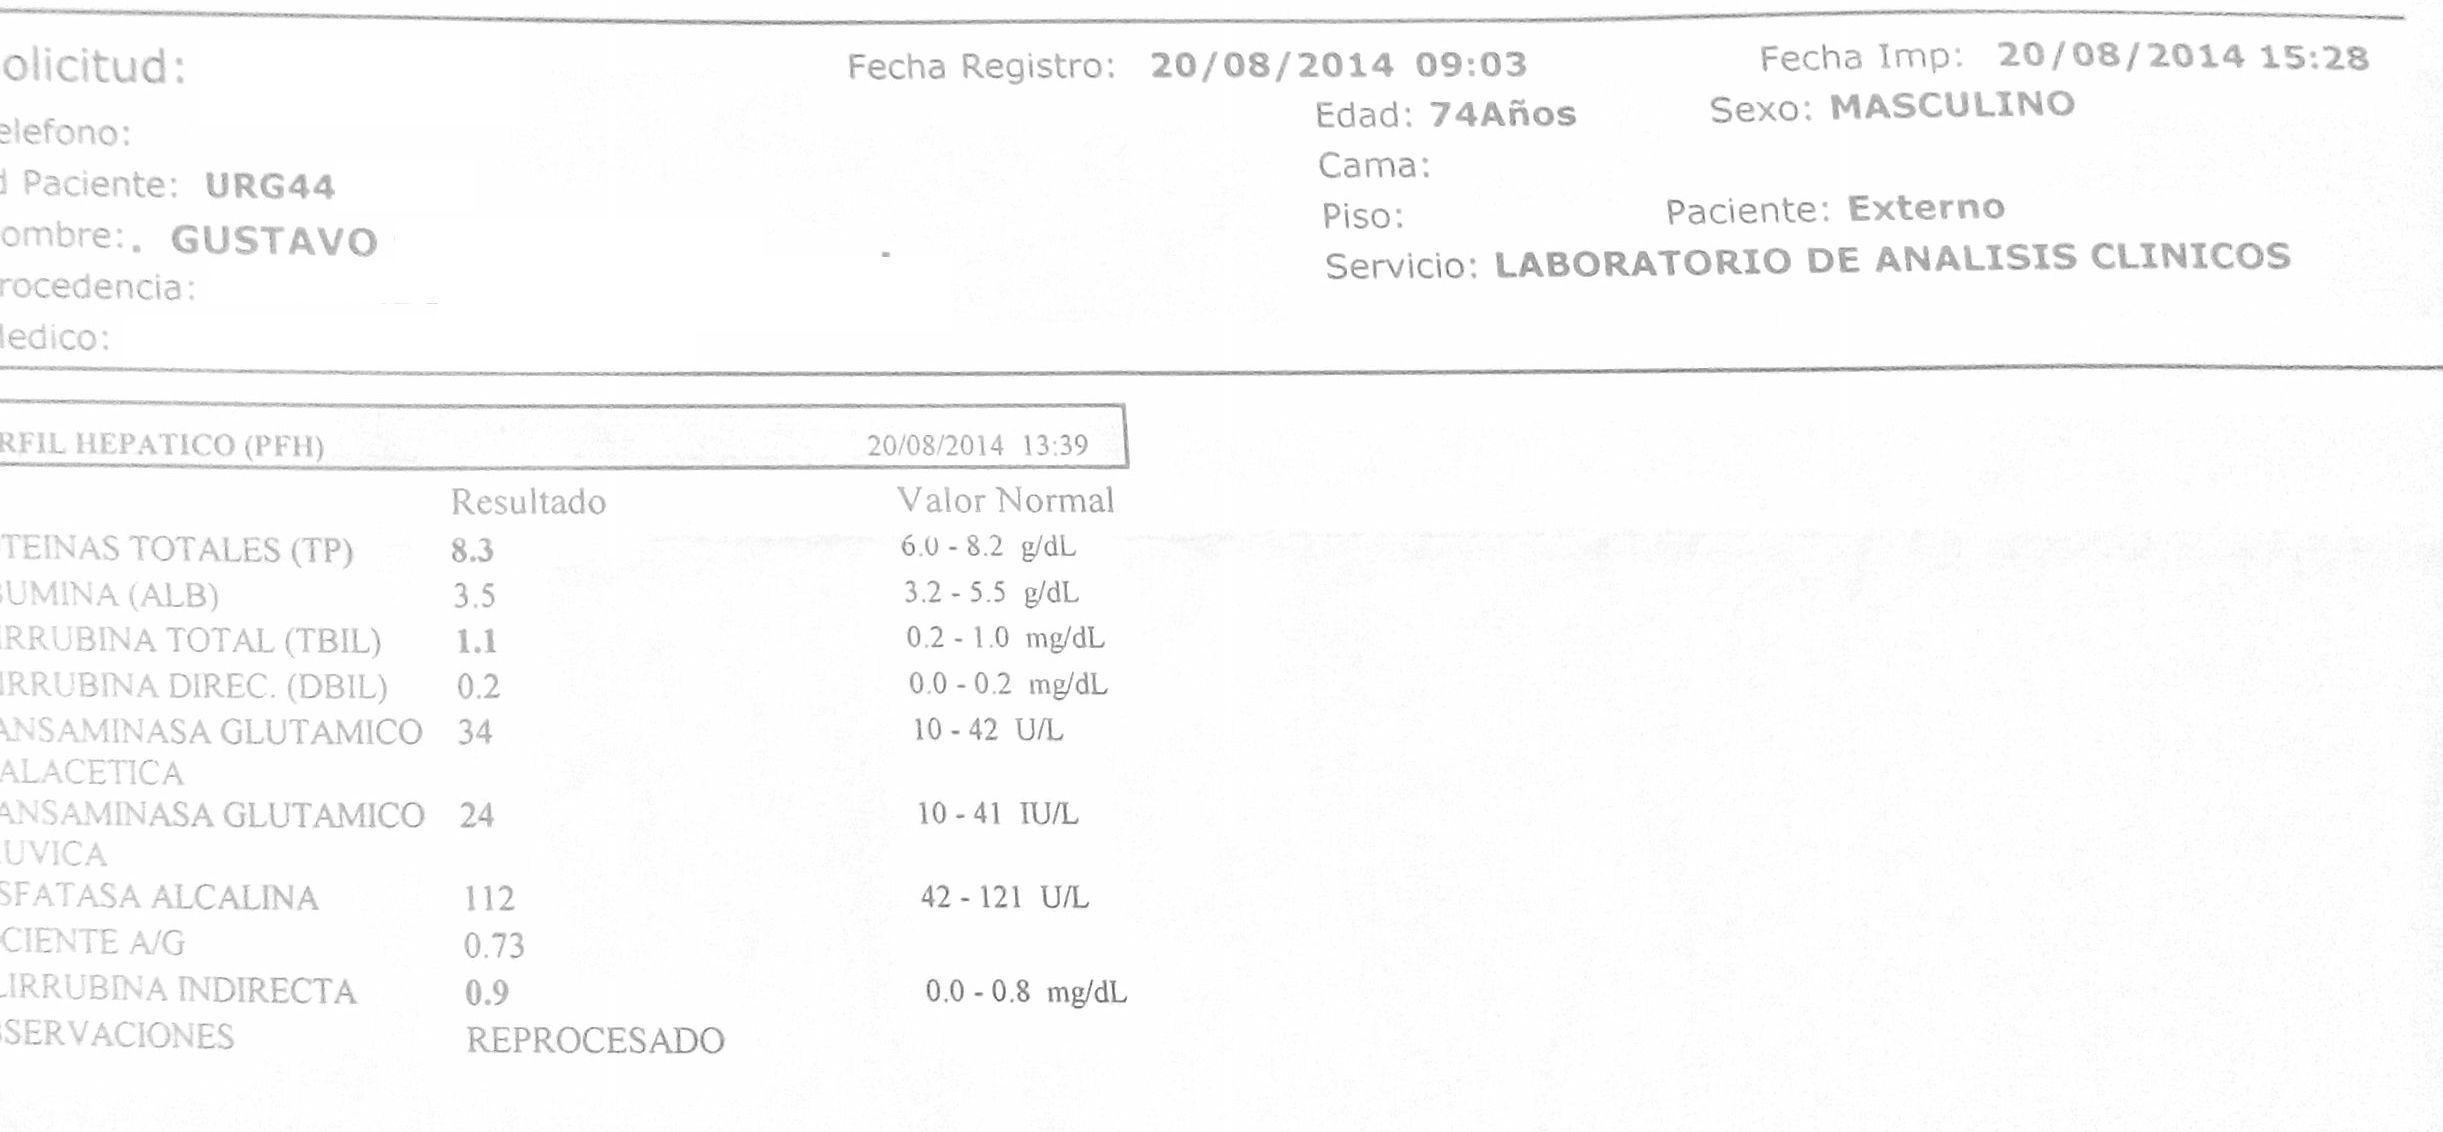 LifEscozul® - Gustavo 5 - Cáncer de Páncreas